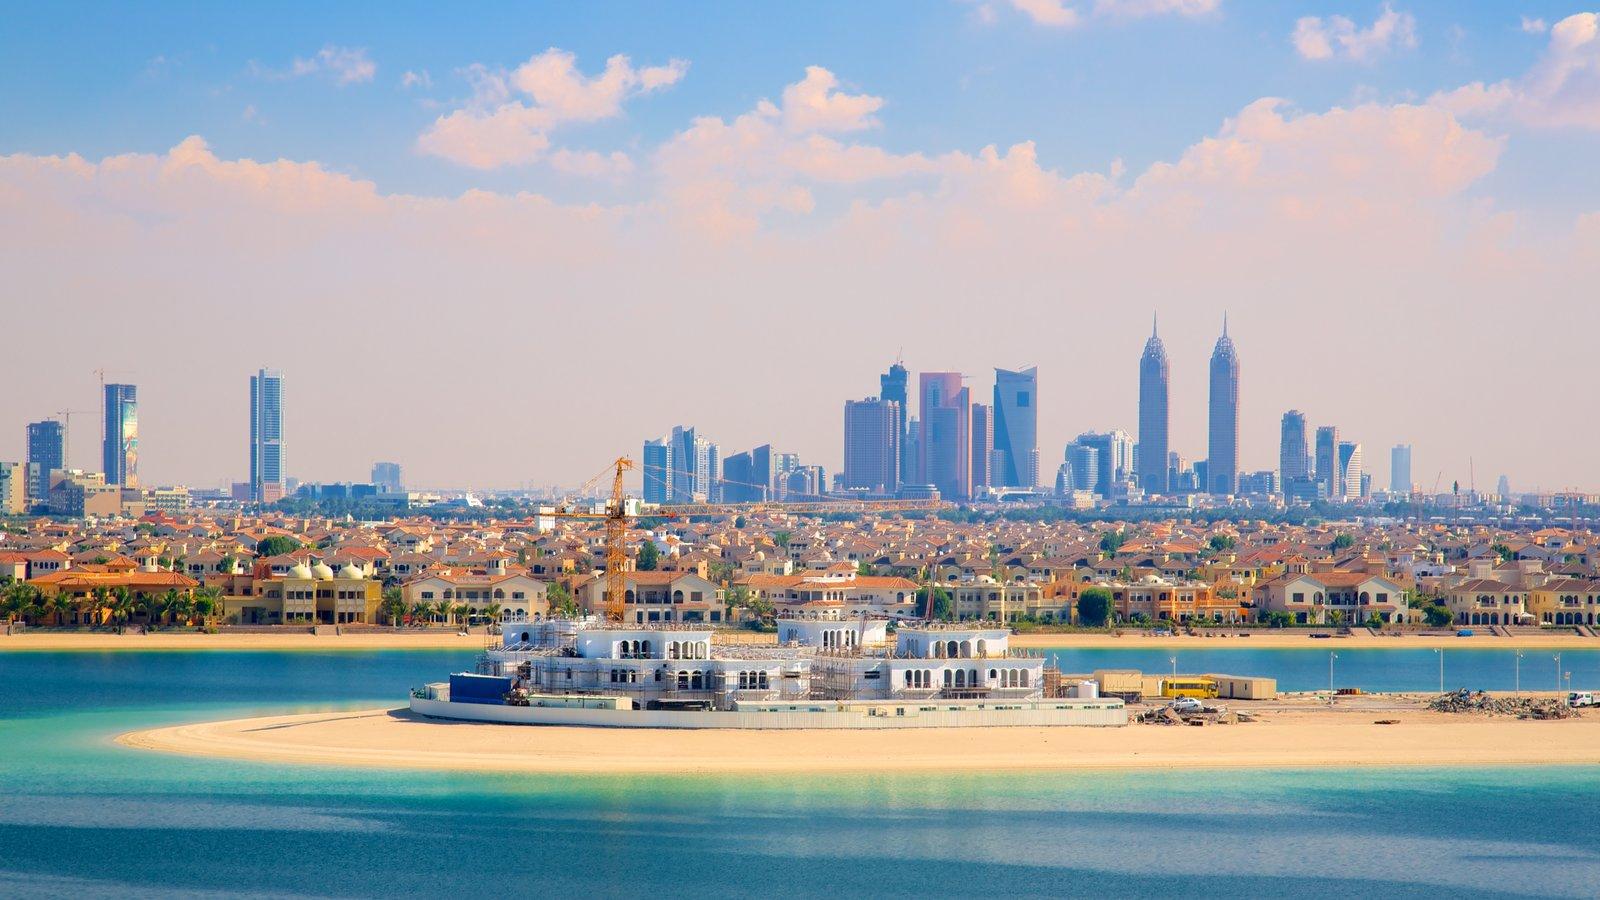 Aquaventure featuring general coastal views, skyline and a sandy beach